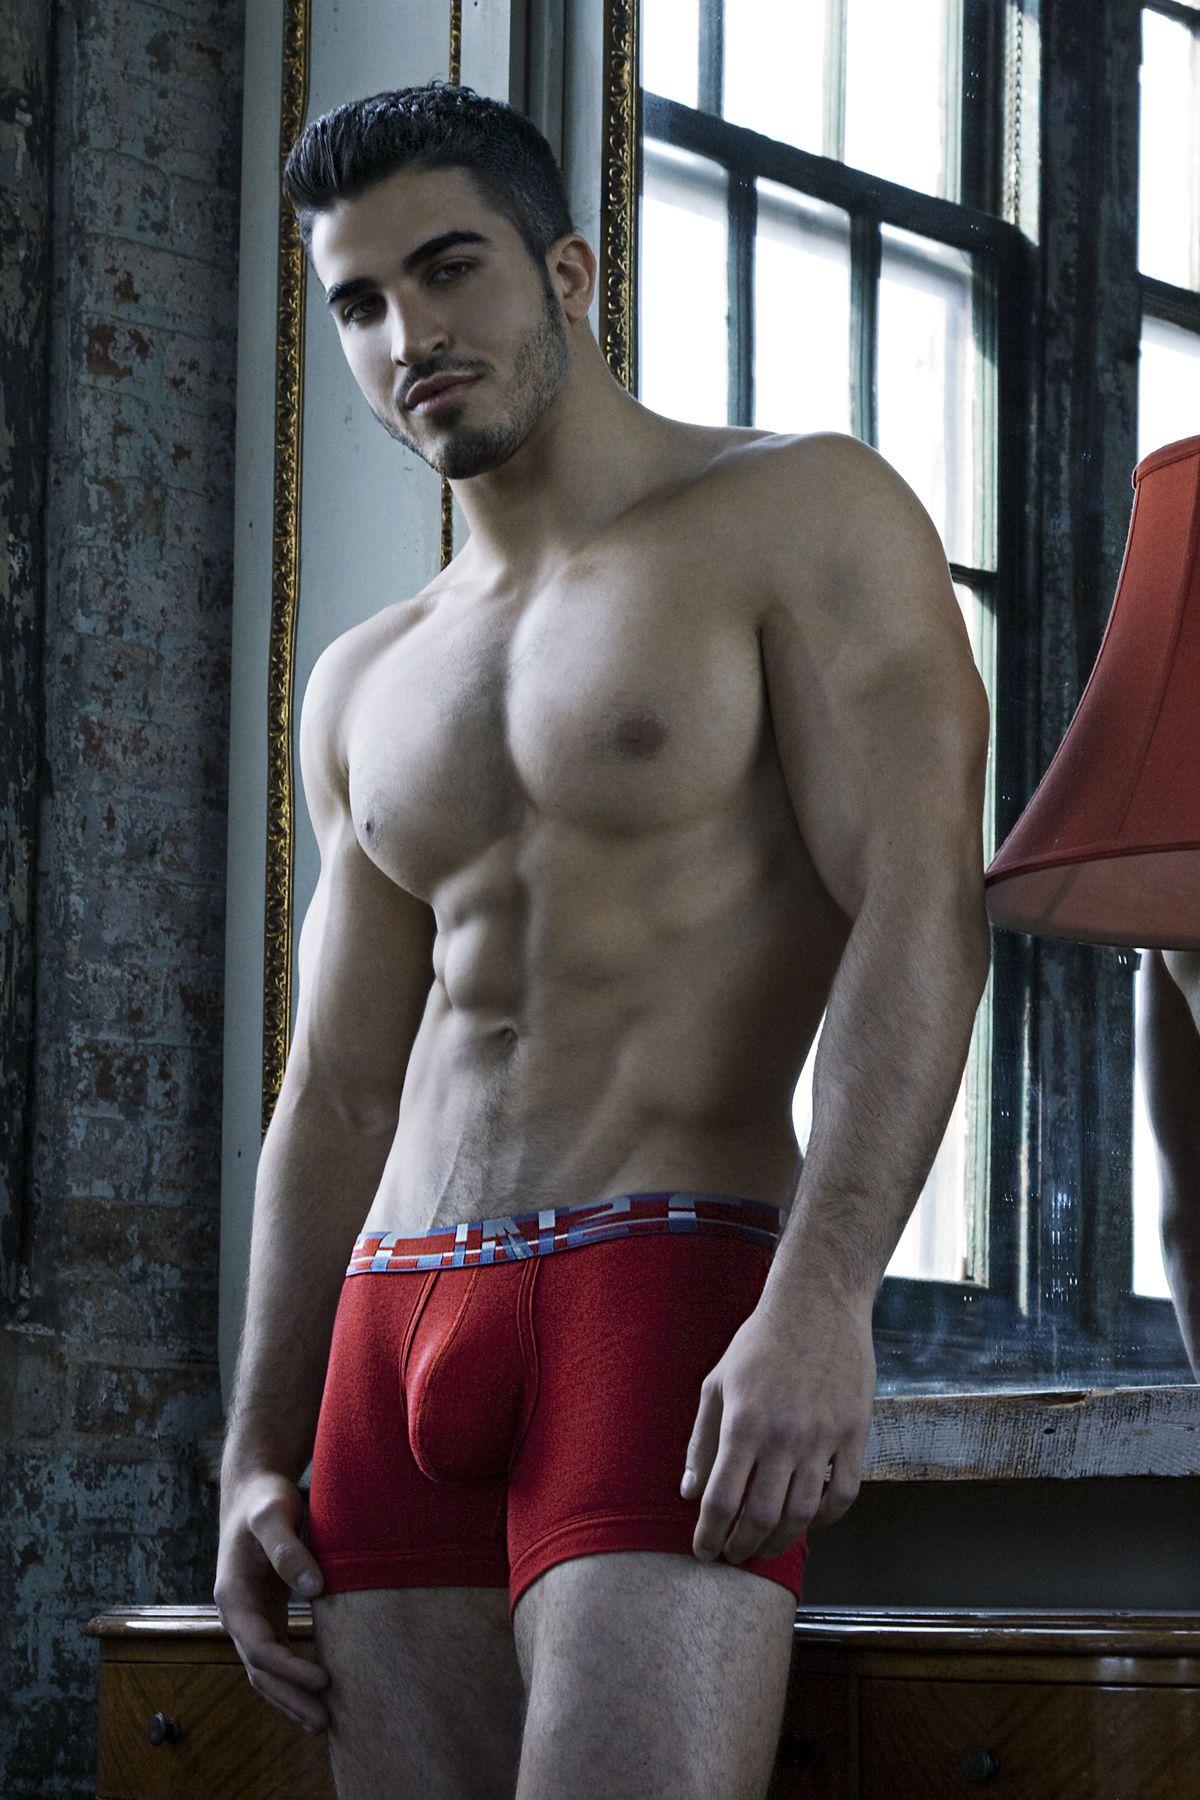 naked-albanian-guy